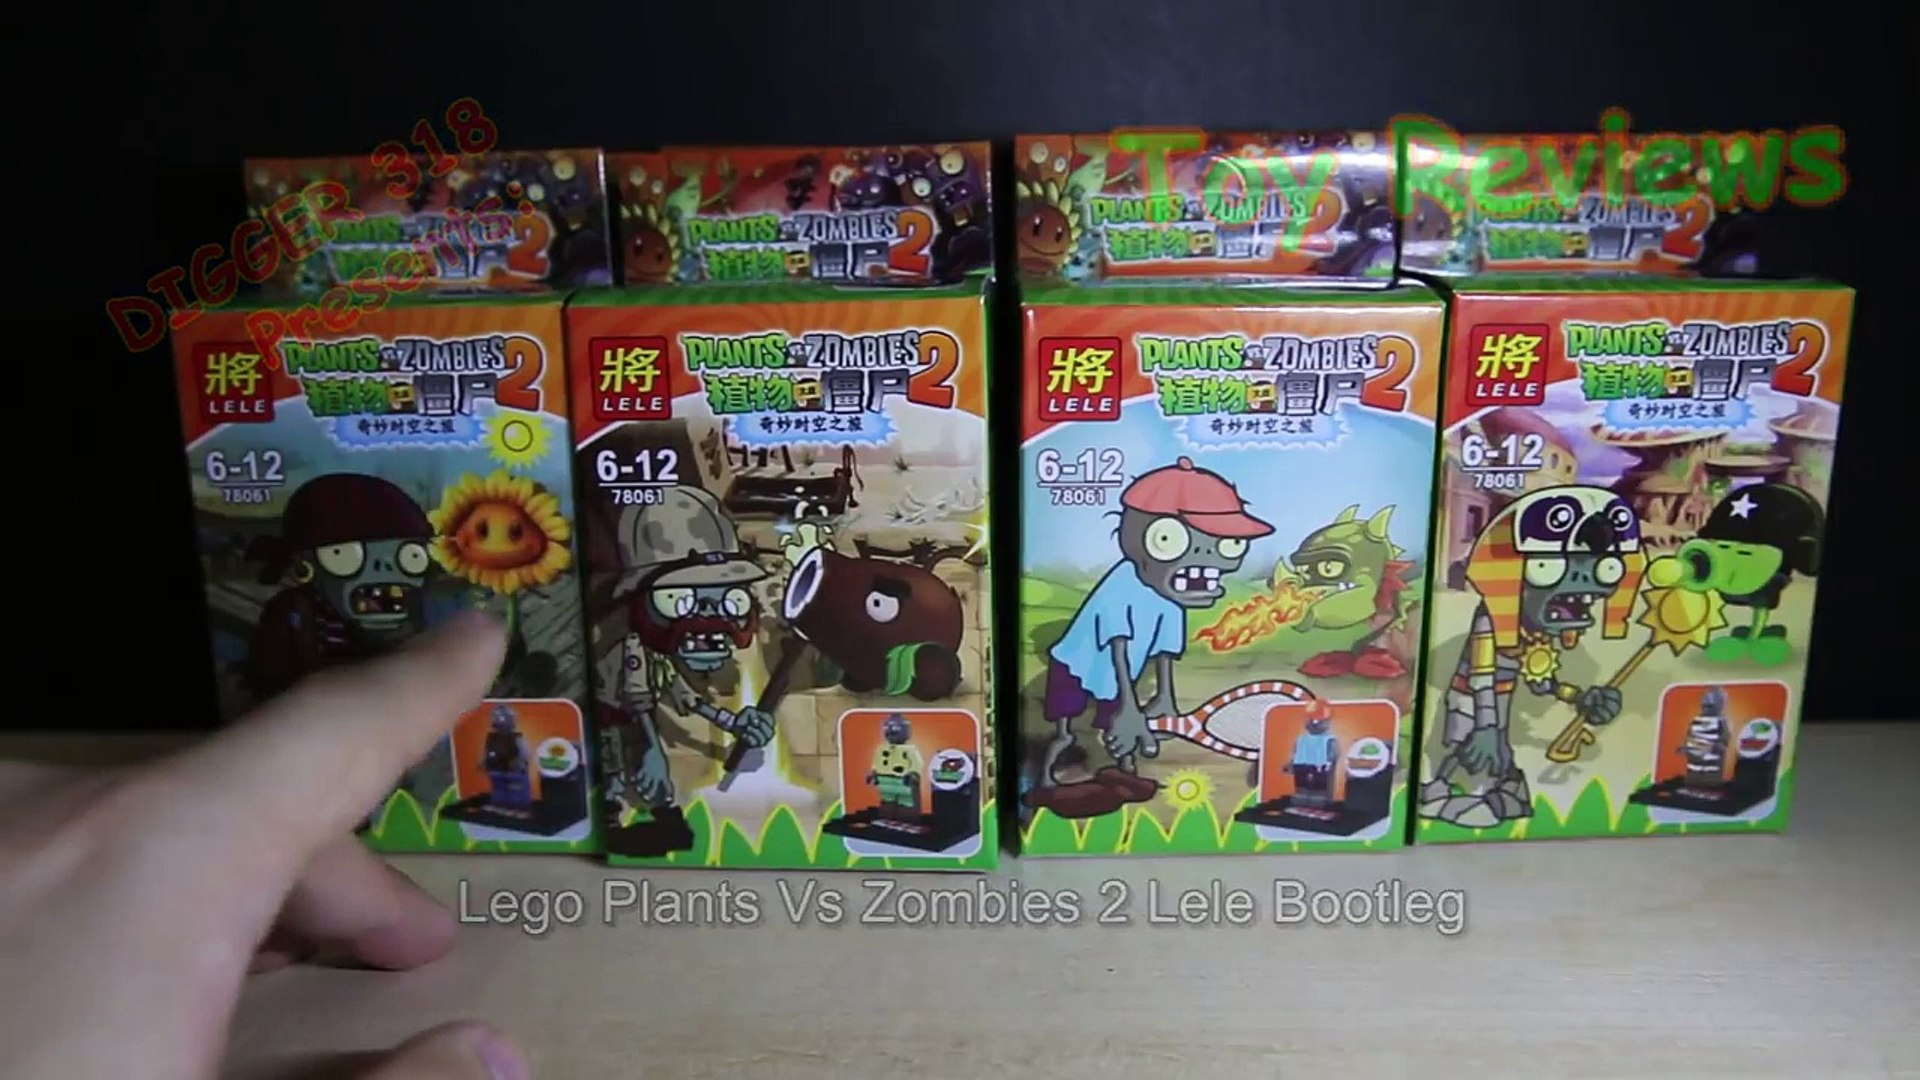 Lego Plants Vs Zombies 2 Lele Bootleg Review